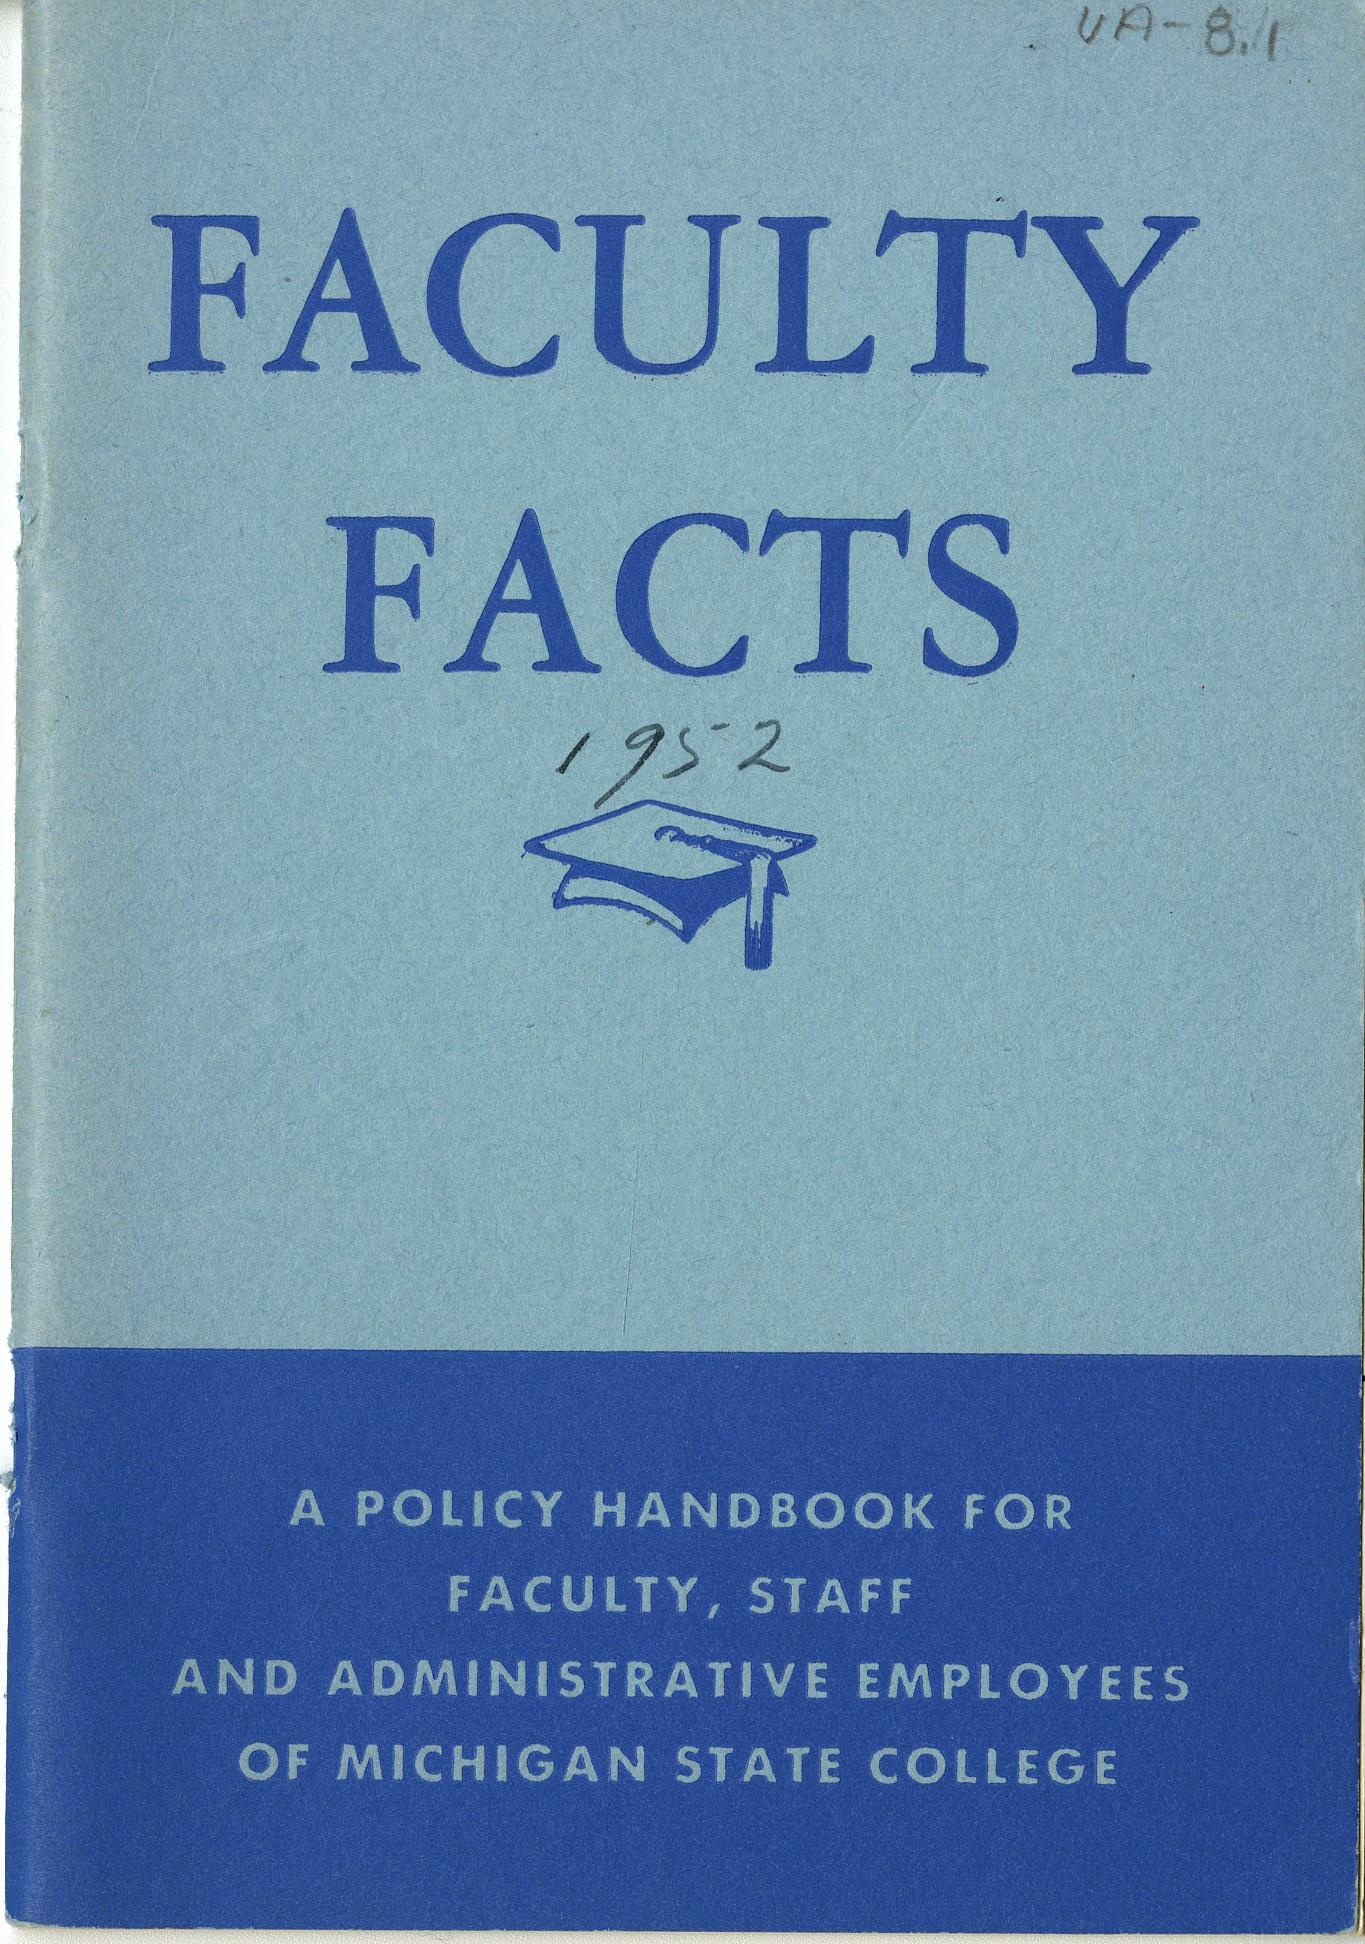 Faculty Handbook, 1952